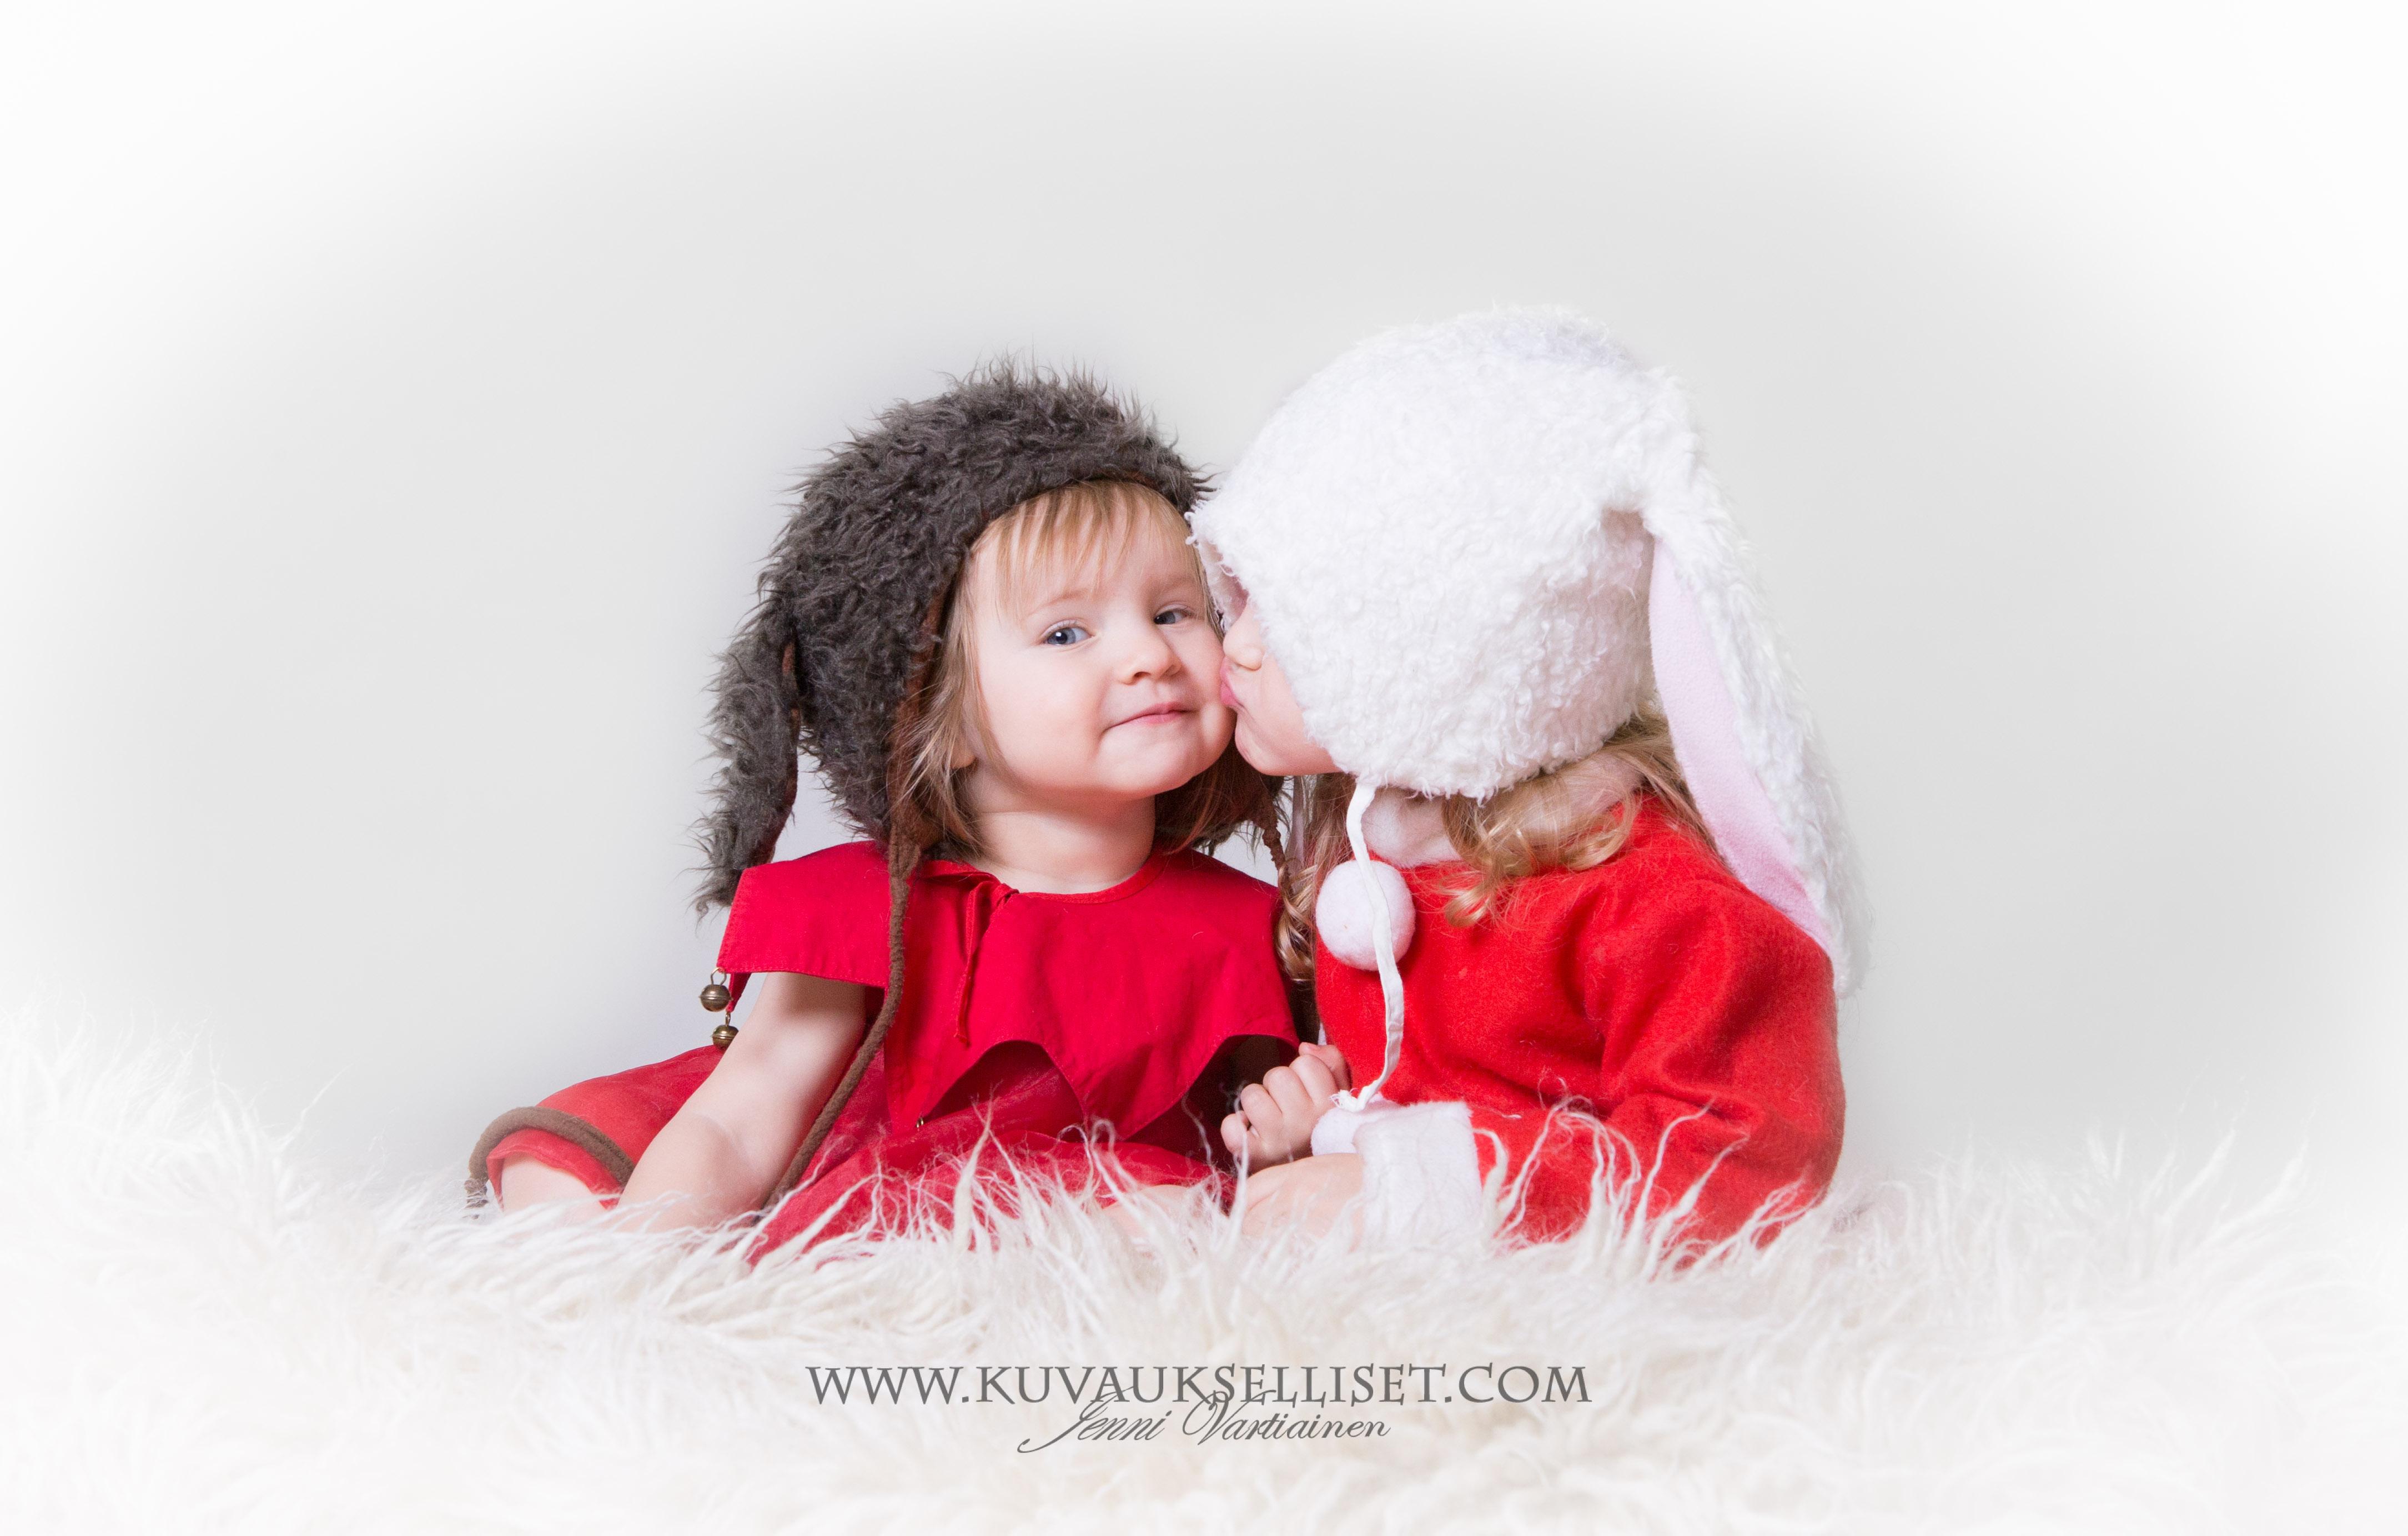 2014.11.10 lapsikuvaus studiokuvaus sisaruskuvaus perhekuvaus 1-vuotiskuvaus muotokuva-3